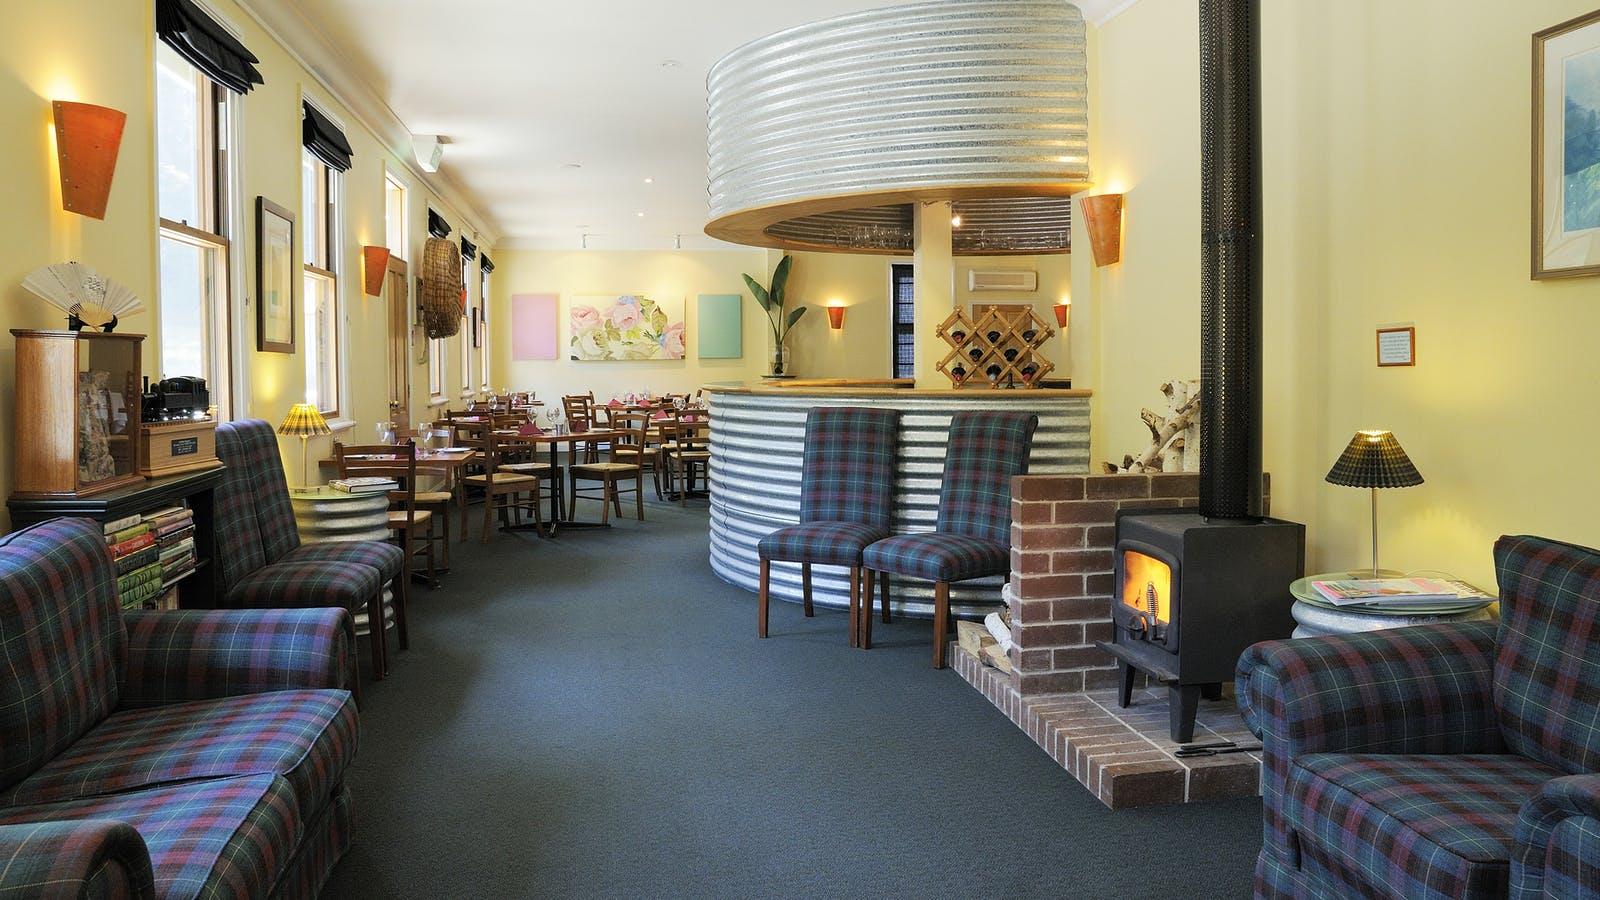 Walhalla's Star Hotel - interior